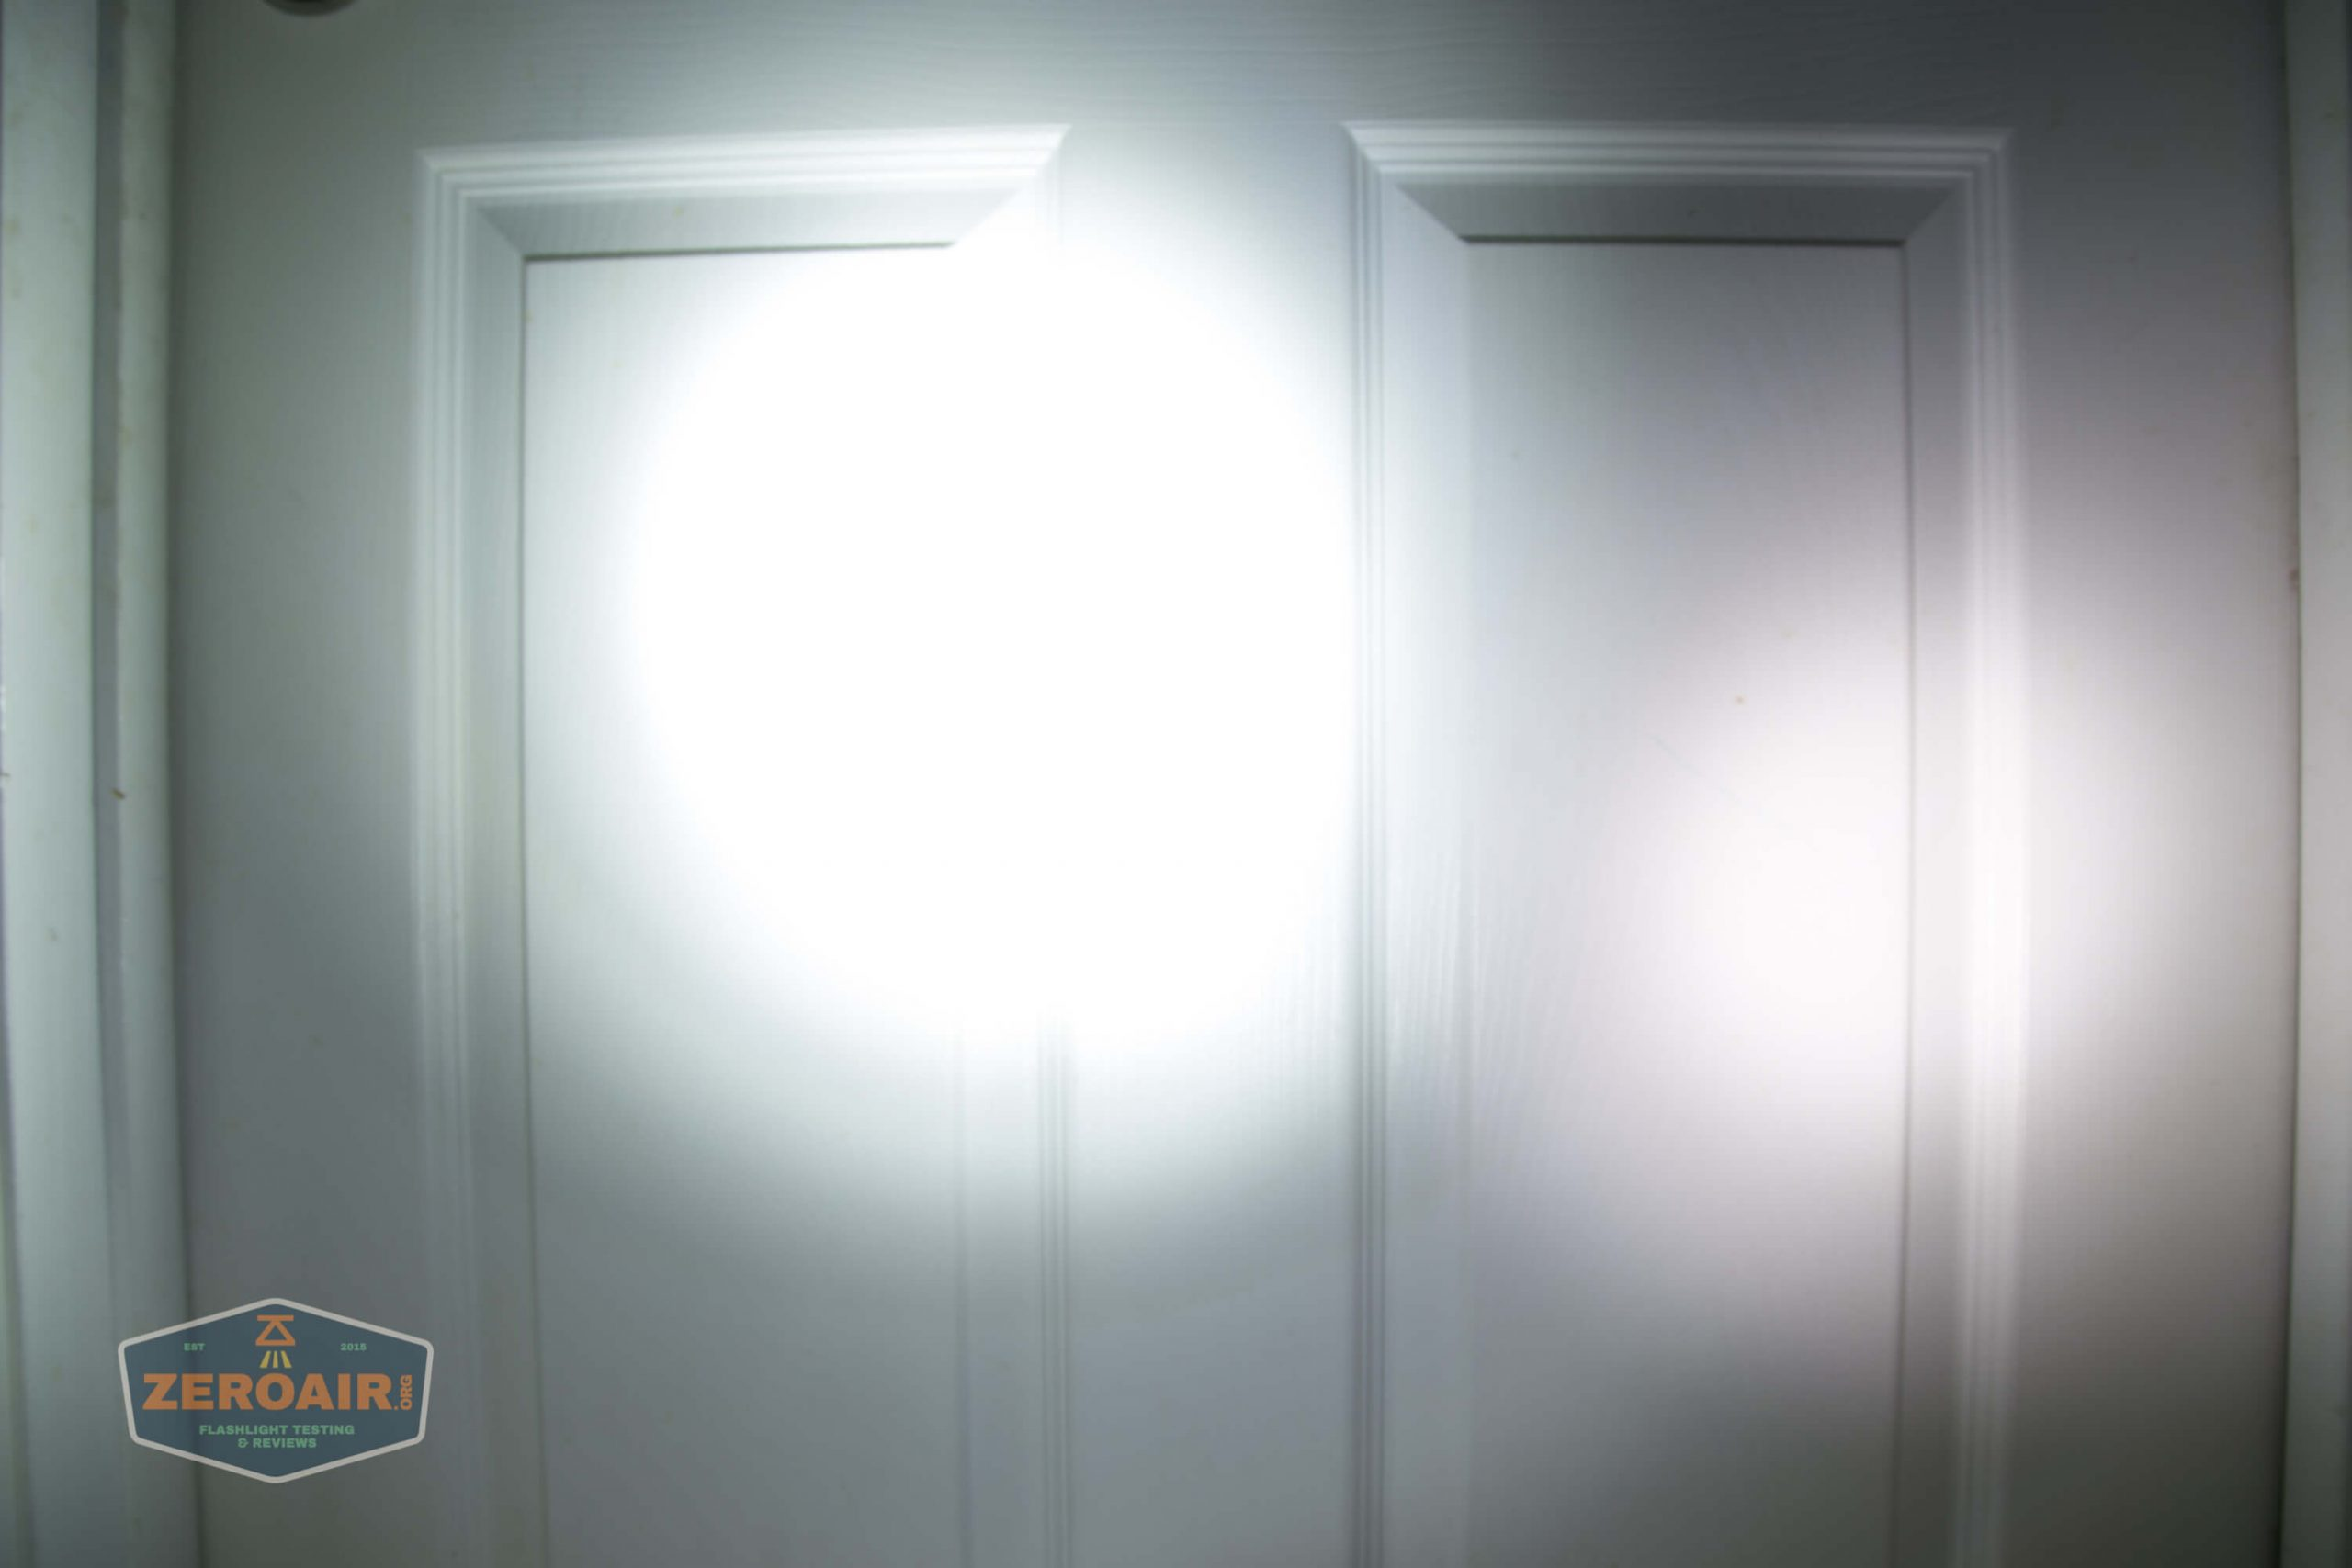 fireflylite e01 luminus sst-40 21700 beamshot door vs blf-348 6